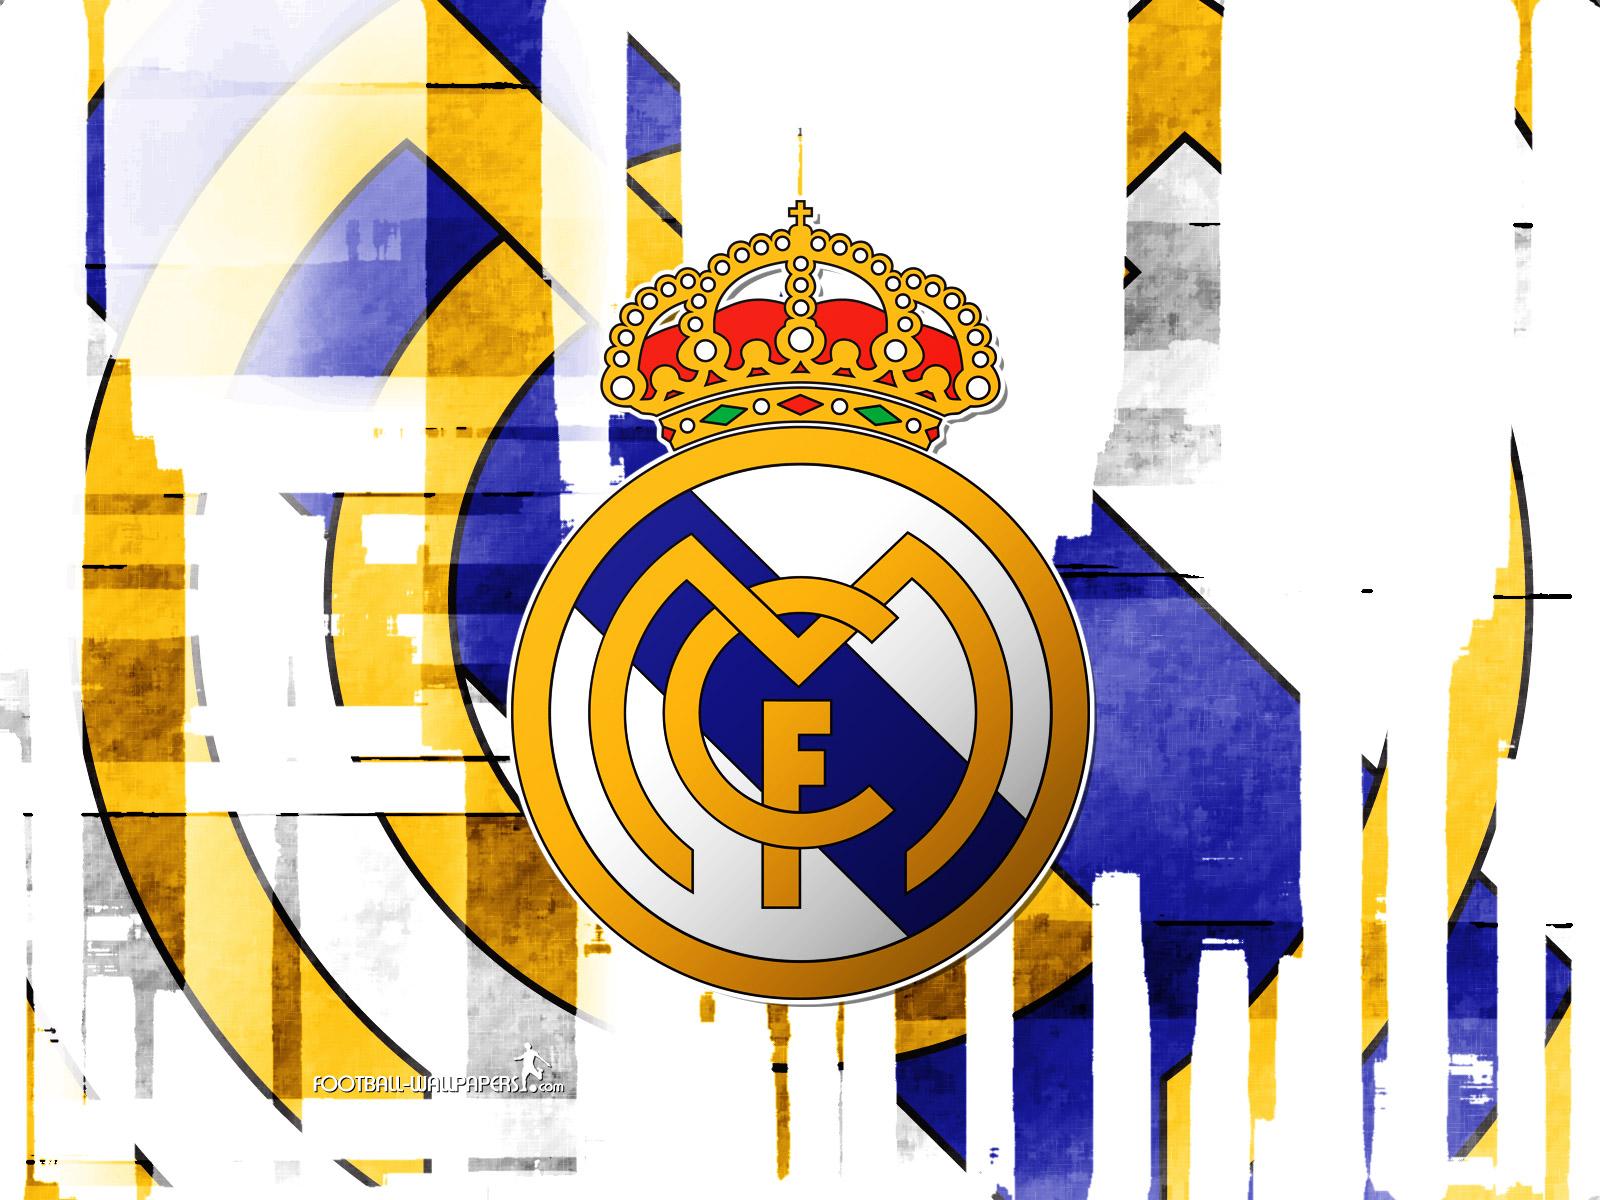 File:Real Madrid logo wallpaper 001.jpg